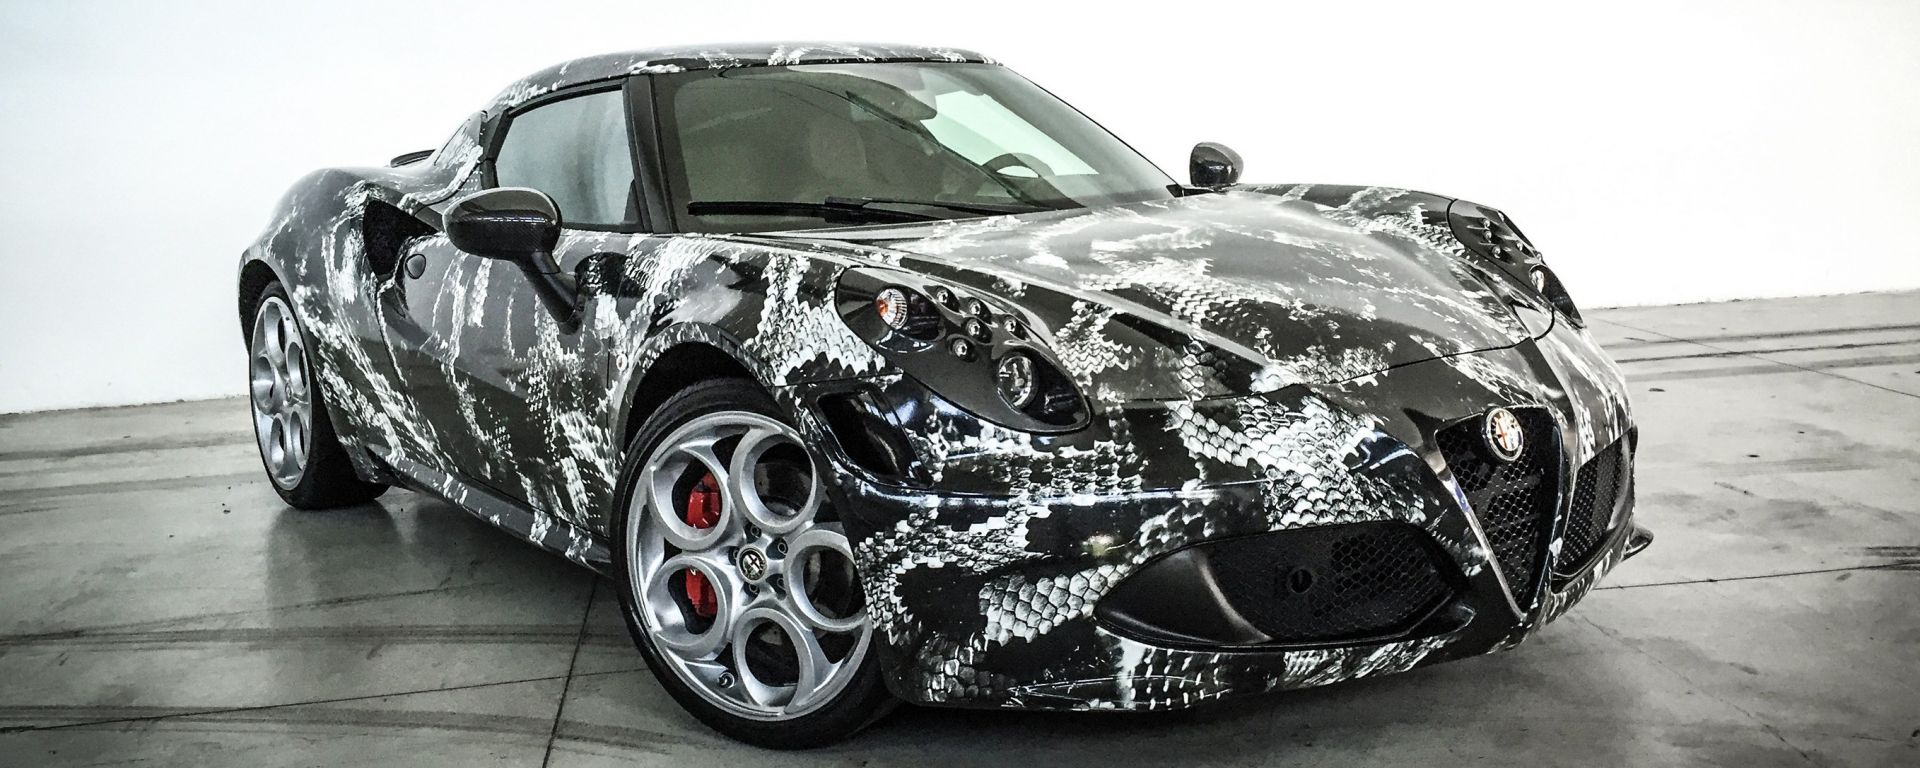 Alfa Romeo 4C Deadly Snake by Garage Italia Customs